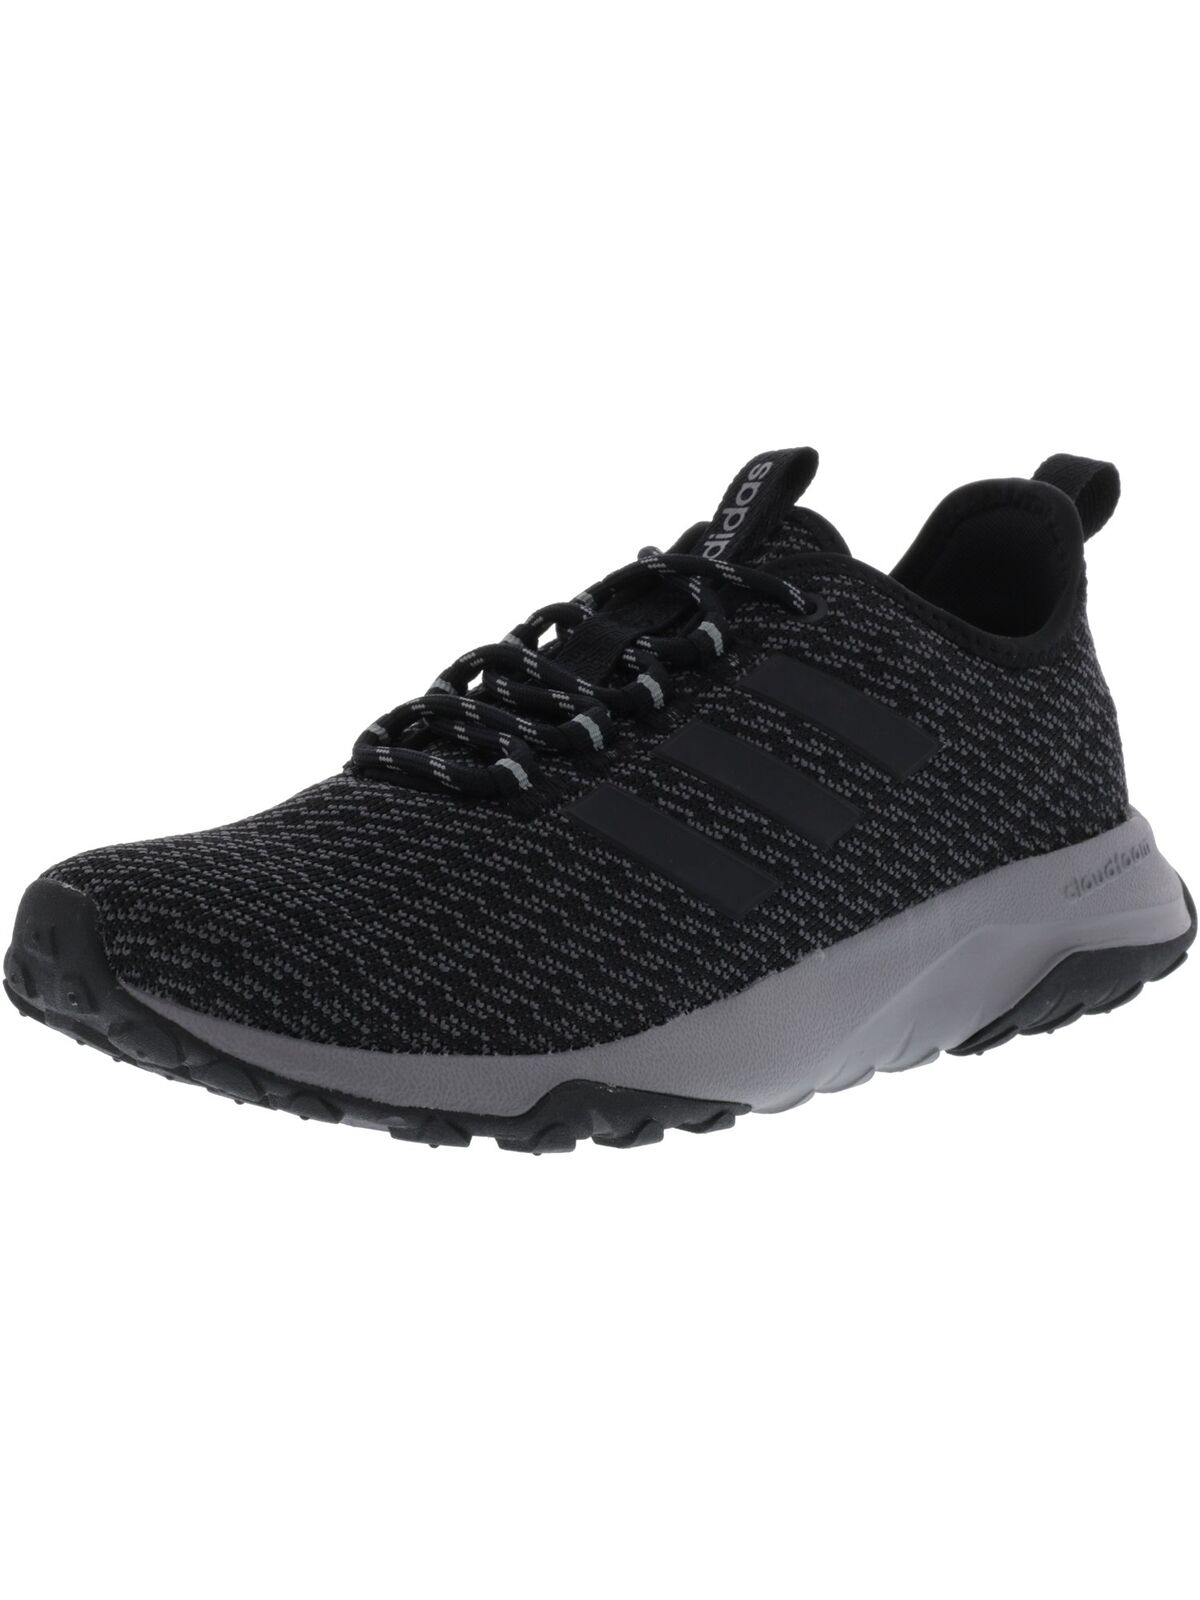 Adidas Men's Cloudfoam Superflex Tr Ankle-High Trail Runner